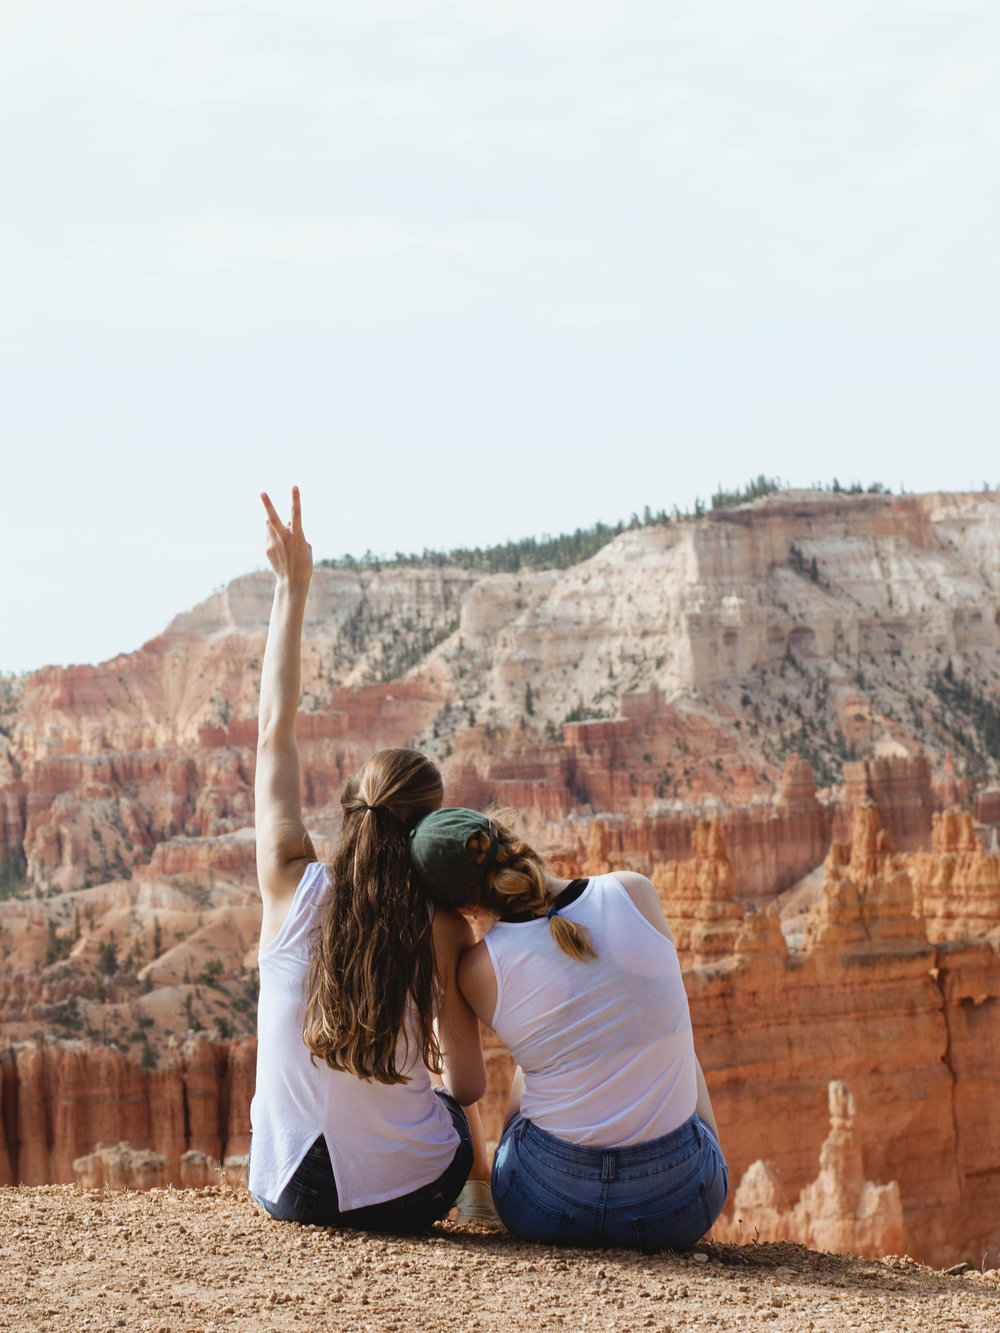 Road trip itinerary for a week in Utah